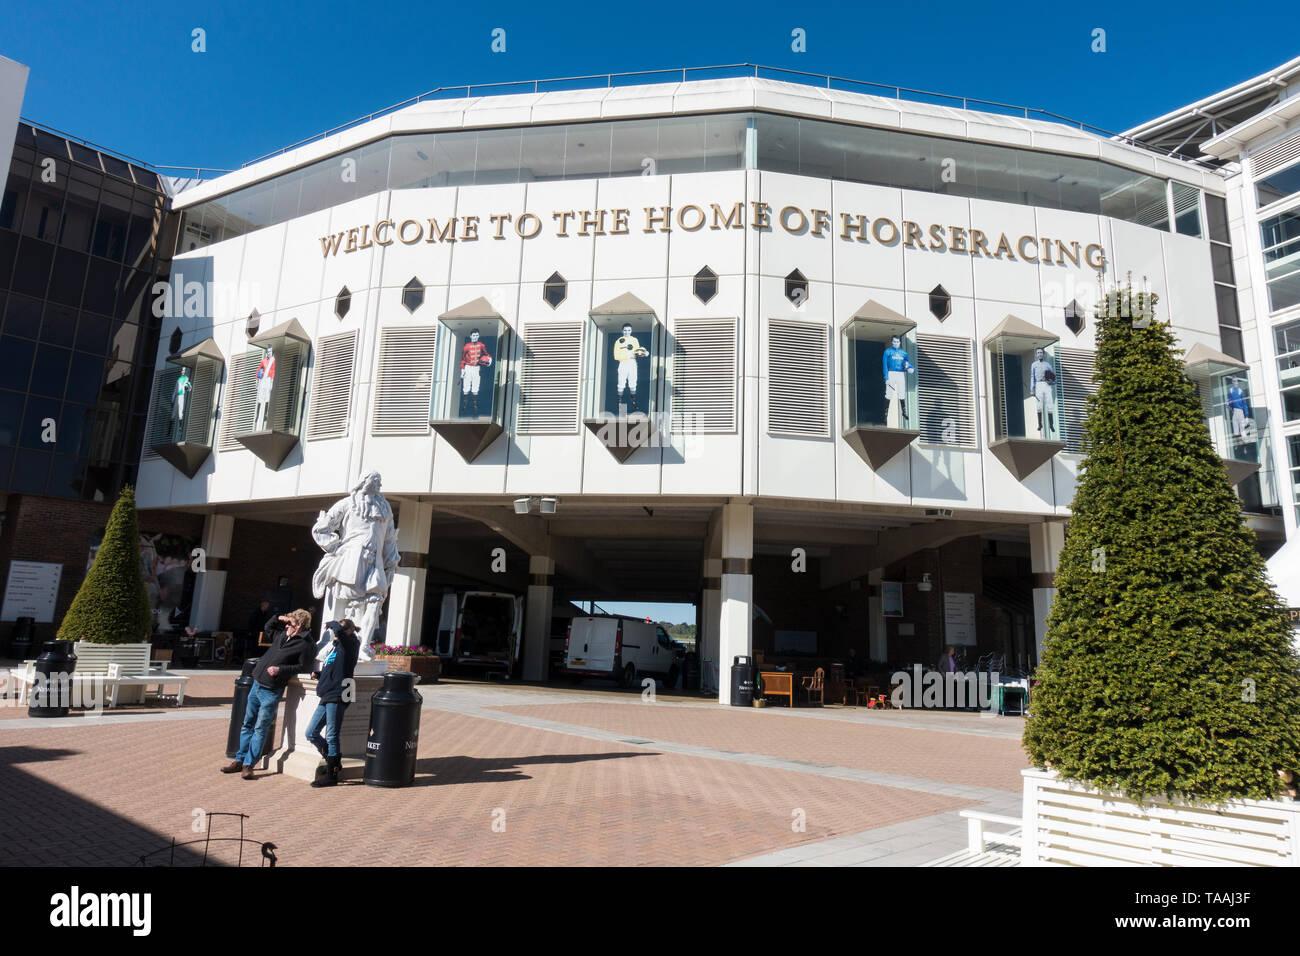 premier-enclosure-newmarket-racecourse-2019-TAAJ3F.jpg